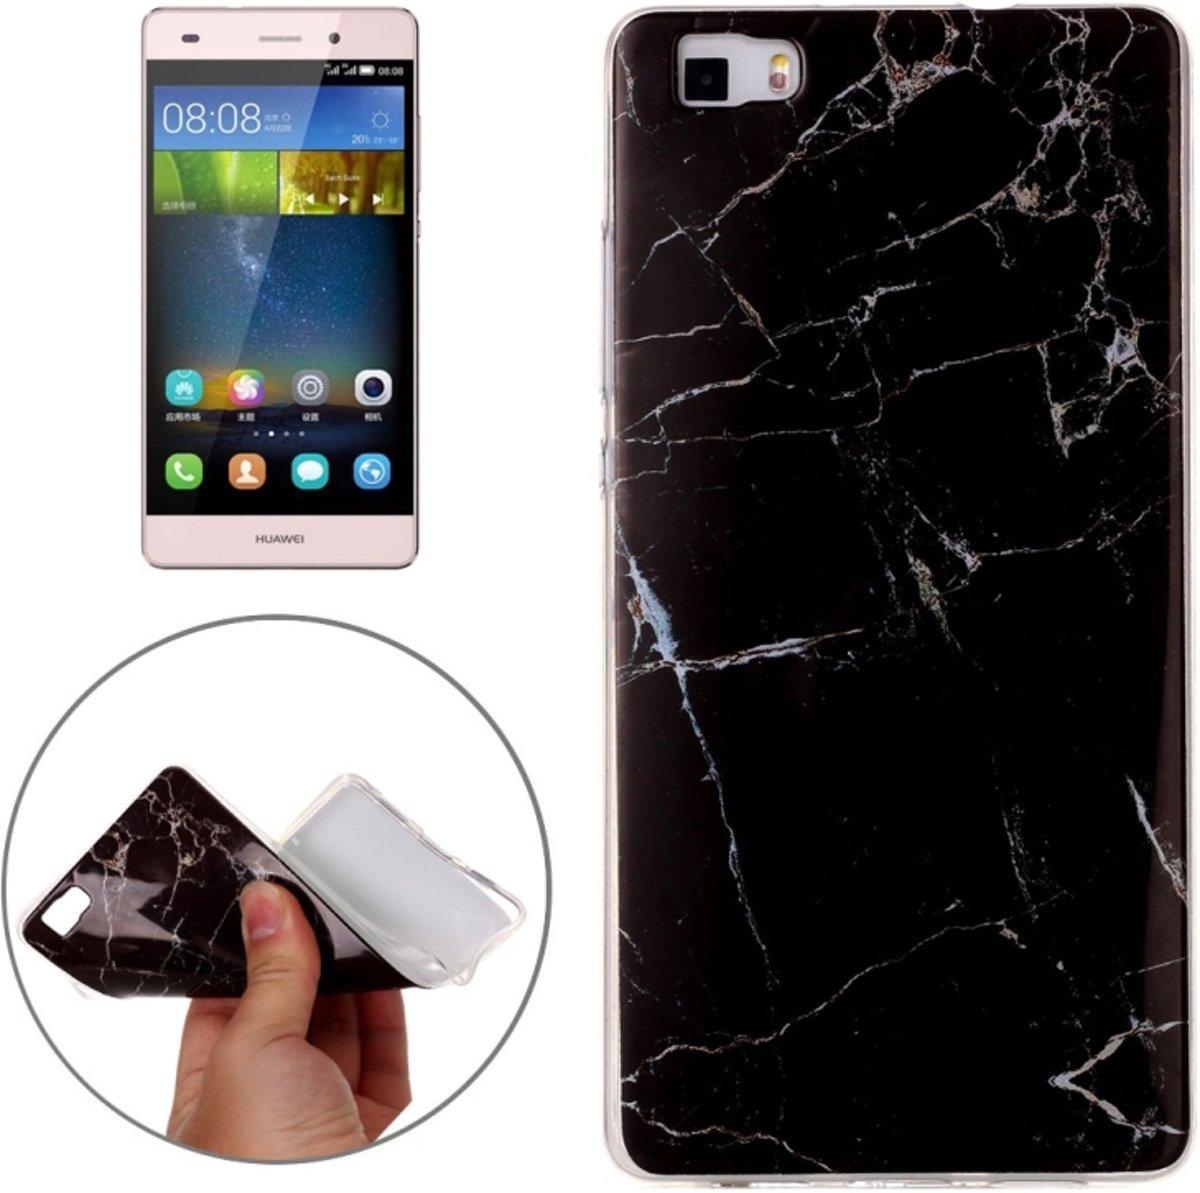 Huawei P8 Lite Zwart marmer patroon beschermend zacht TPU Back Cover Hoesje